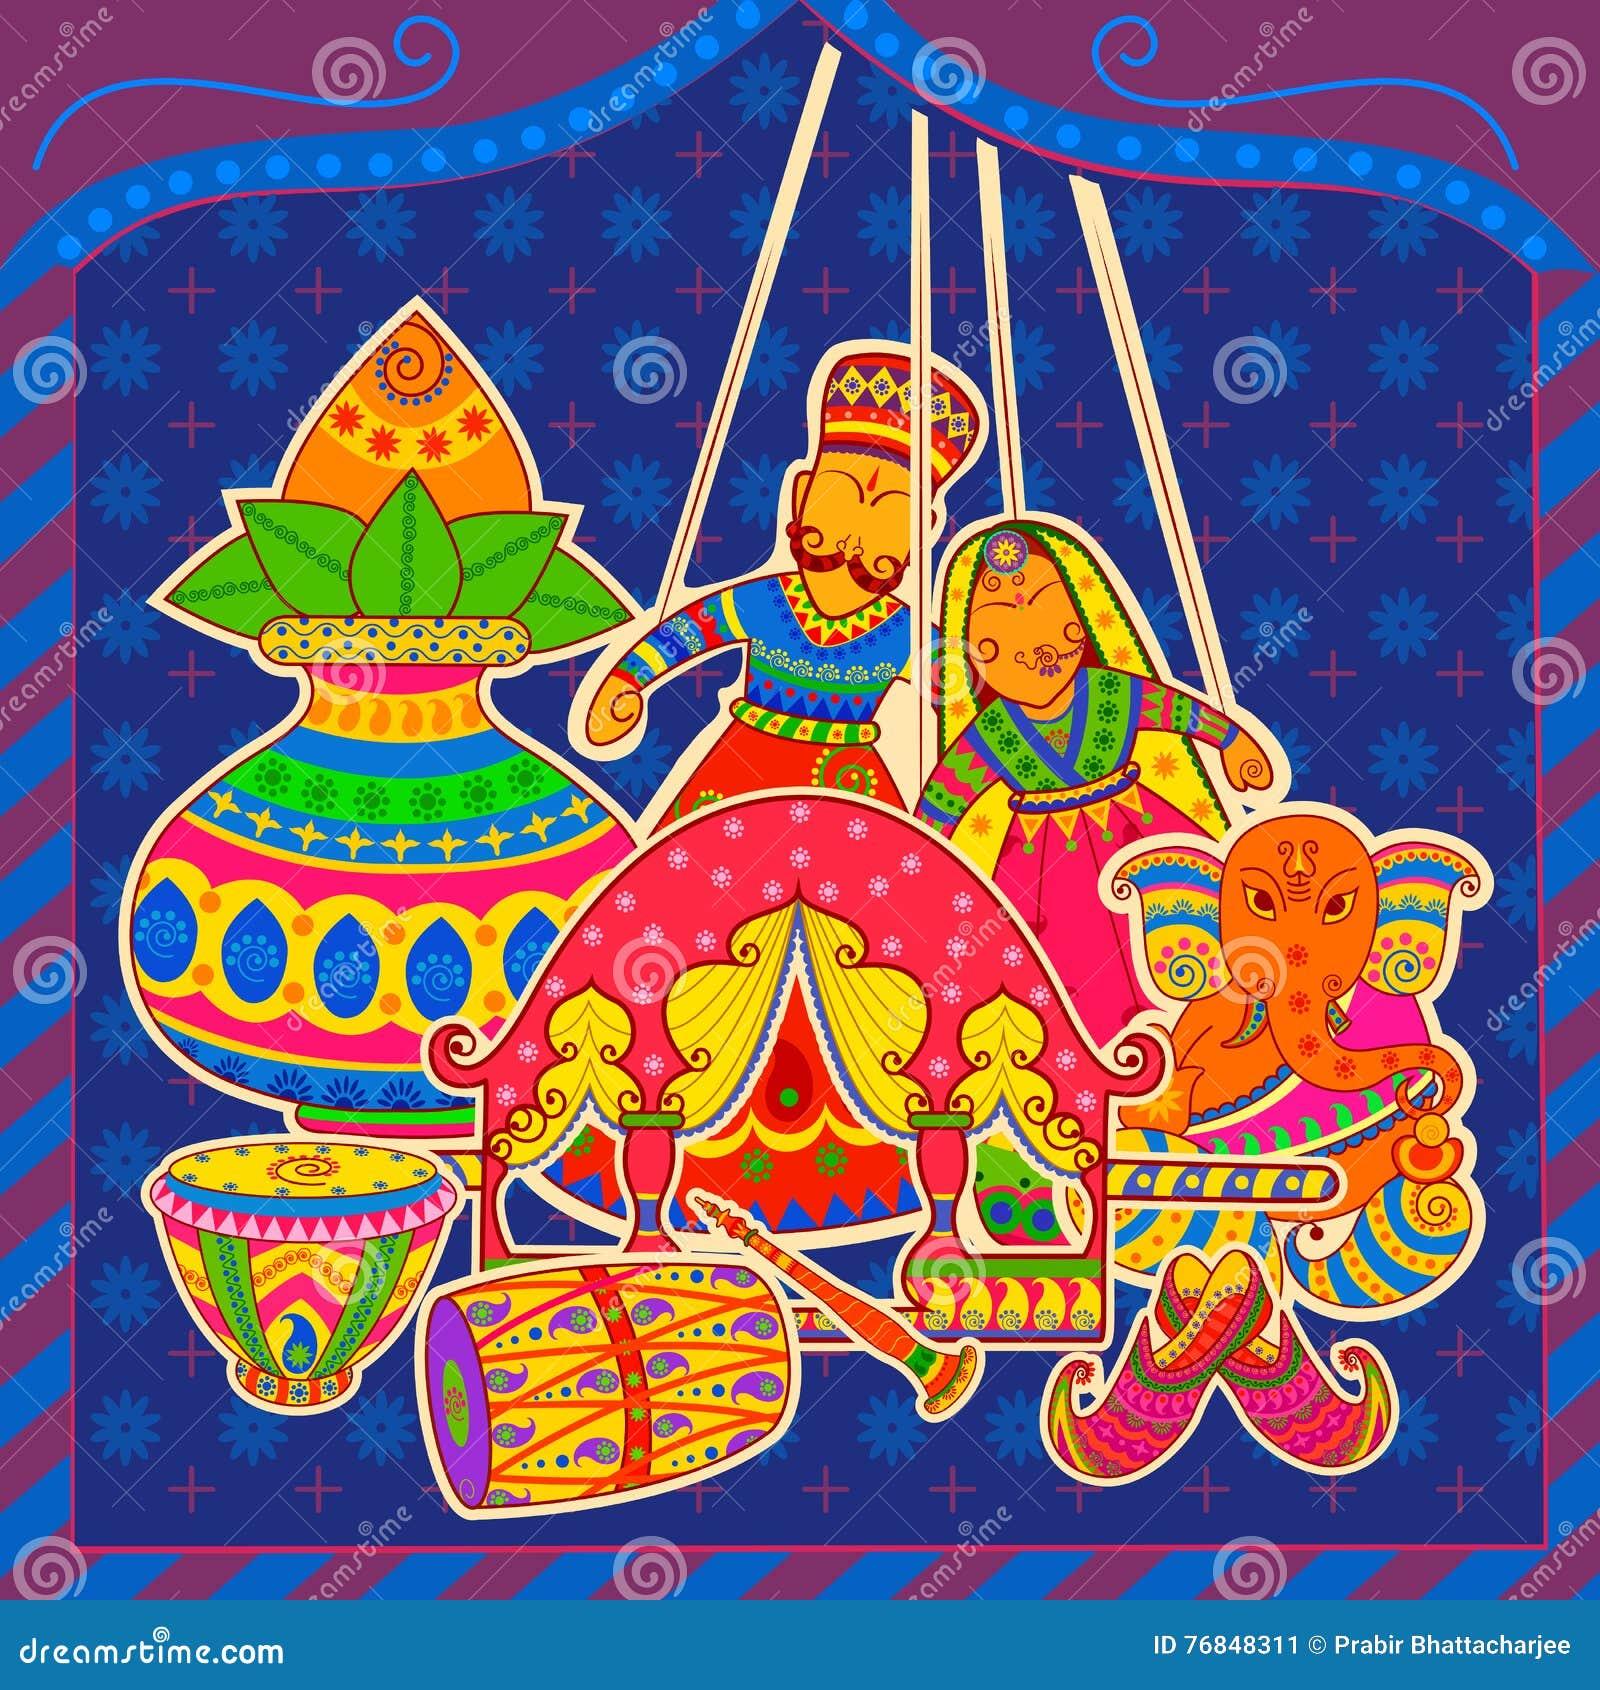 vivah cartoons  illustrations  u0026 vector stock images